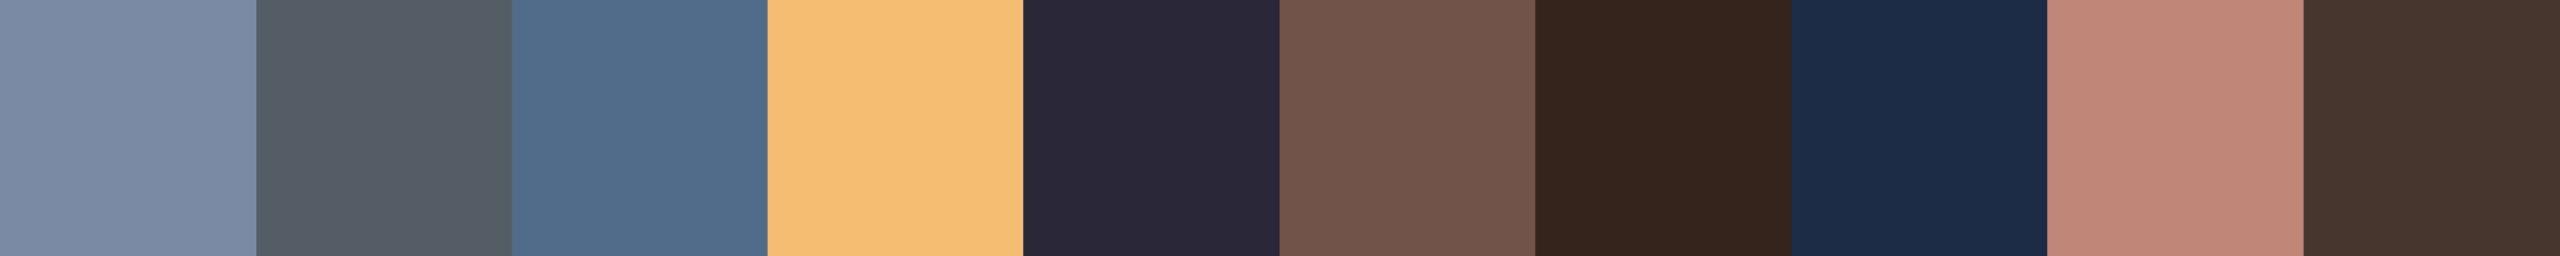 739 Gorgocona Color Palette